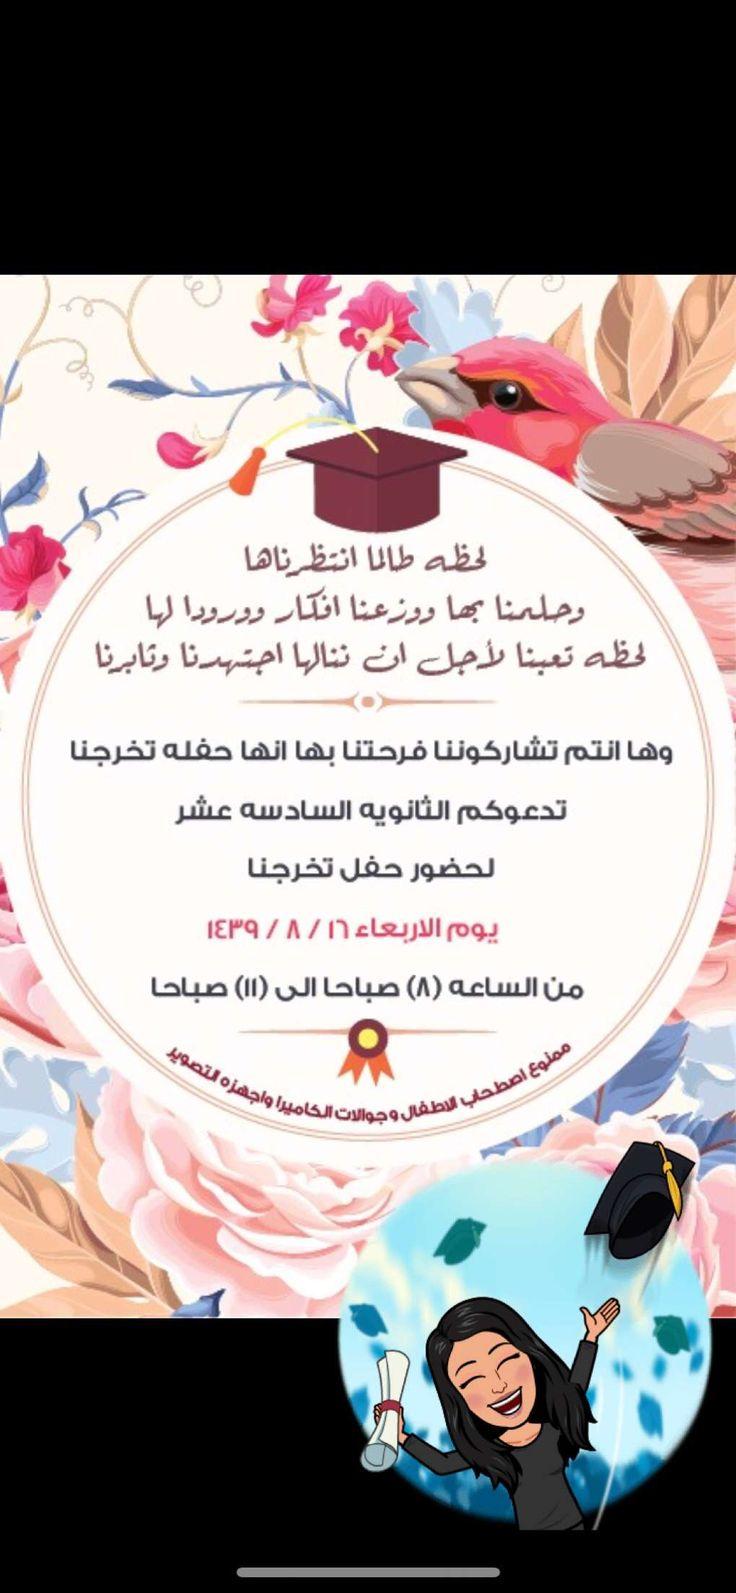 Graduation invitation cards بطايق دعوه للتخرج #تخرج #دعوه ...